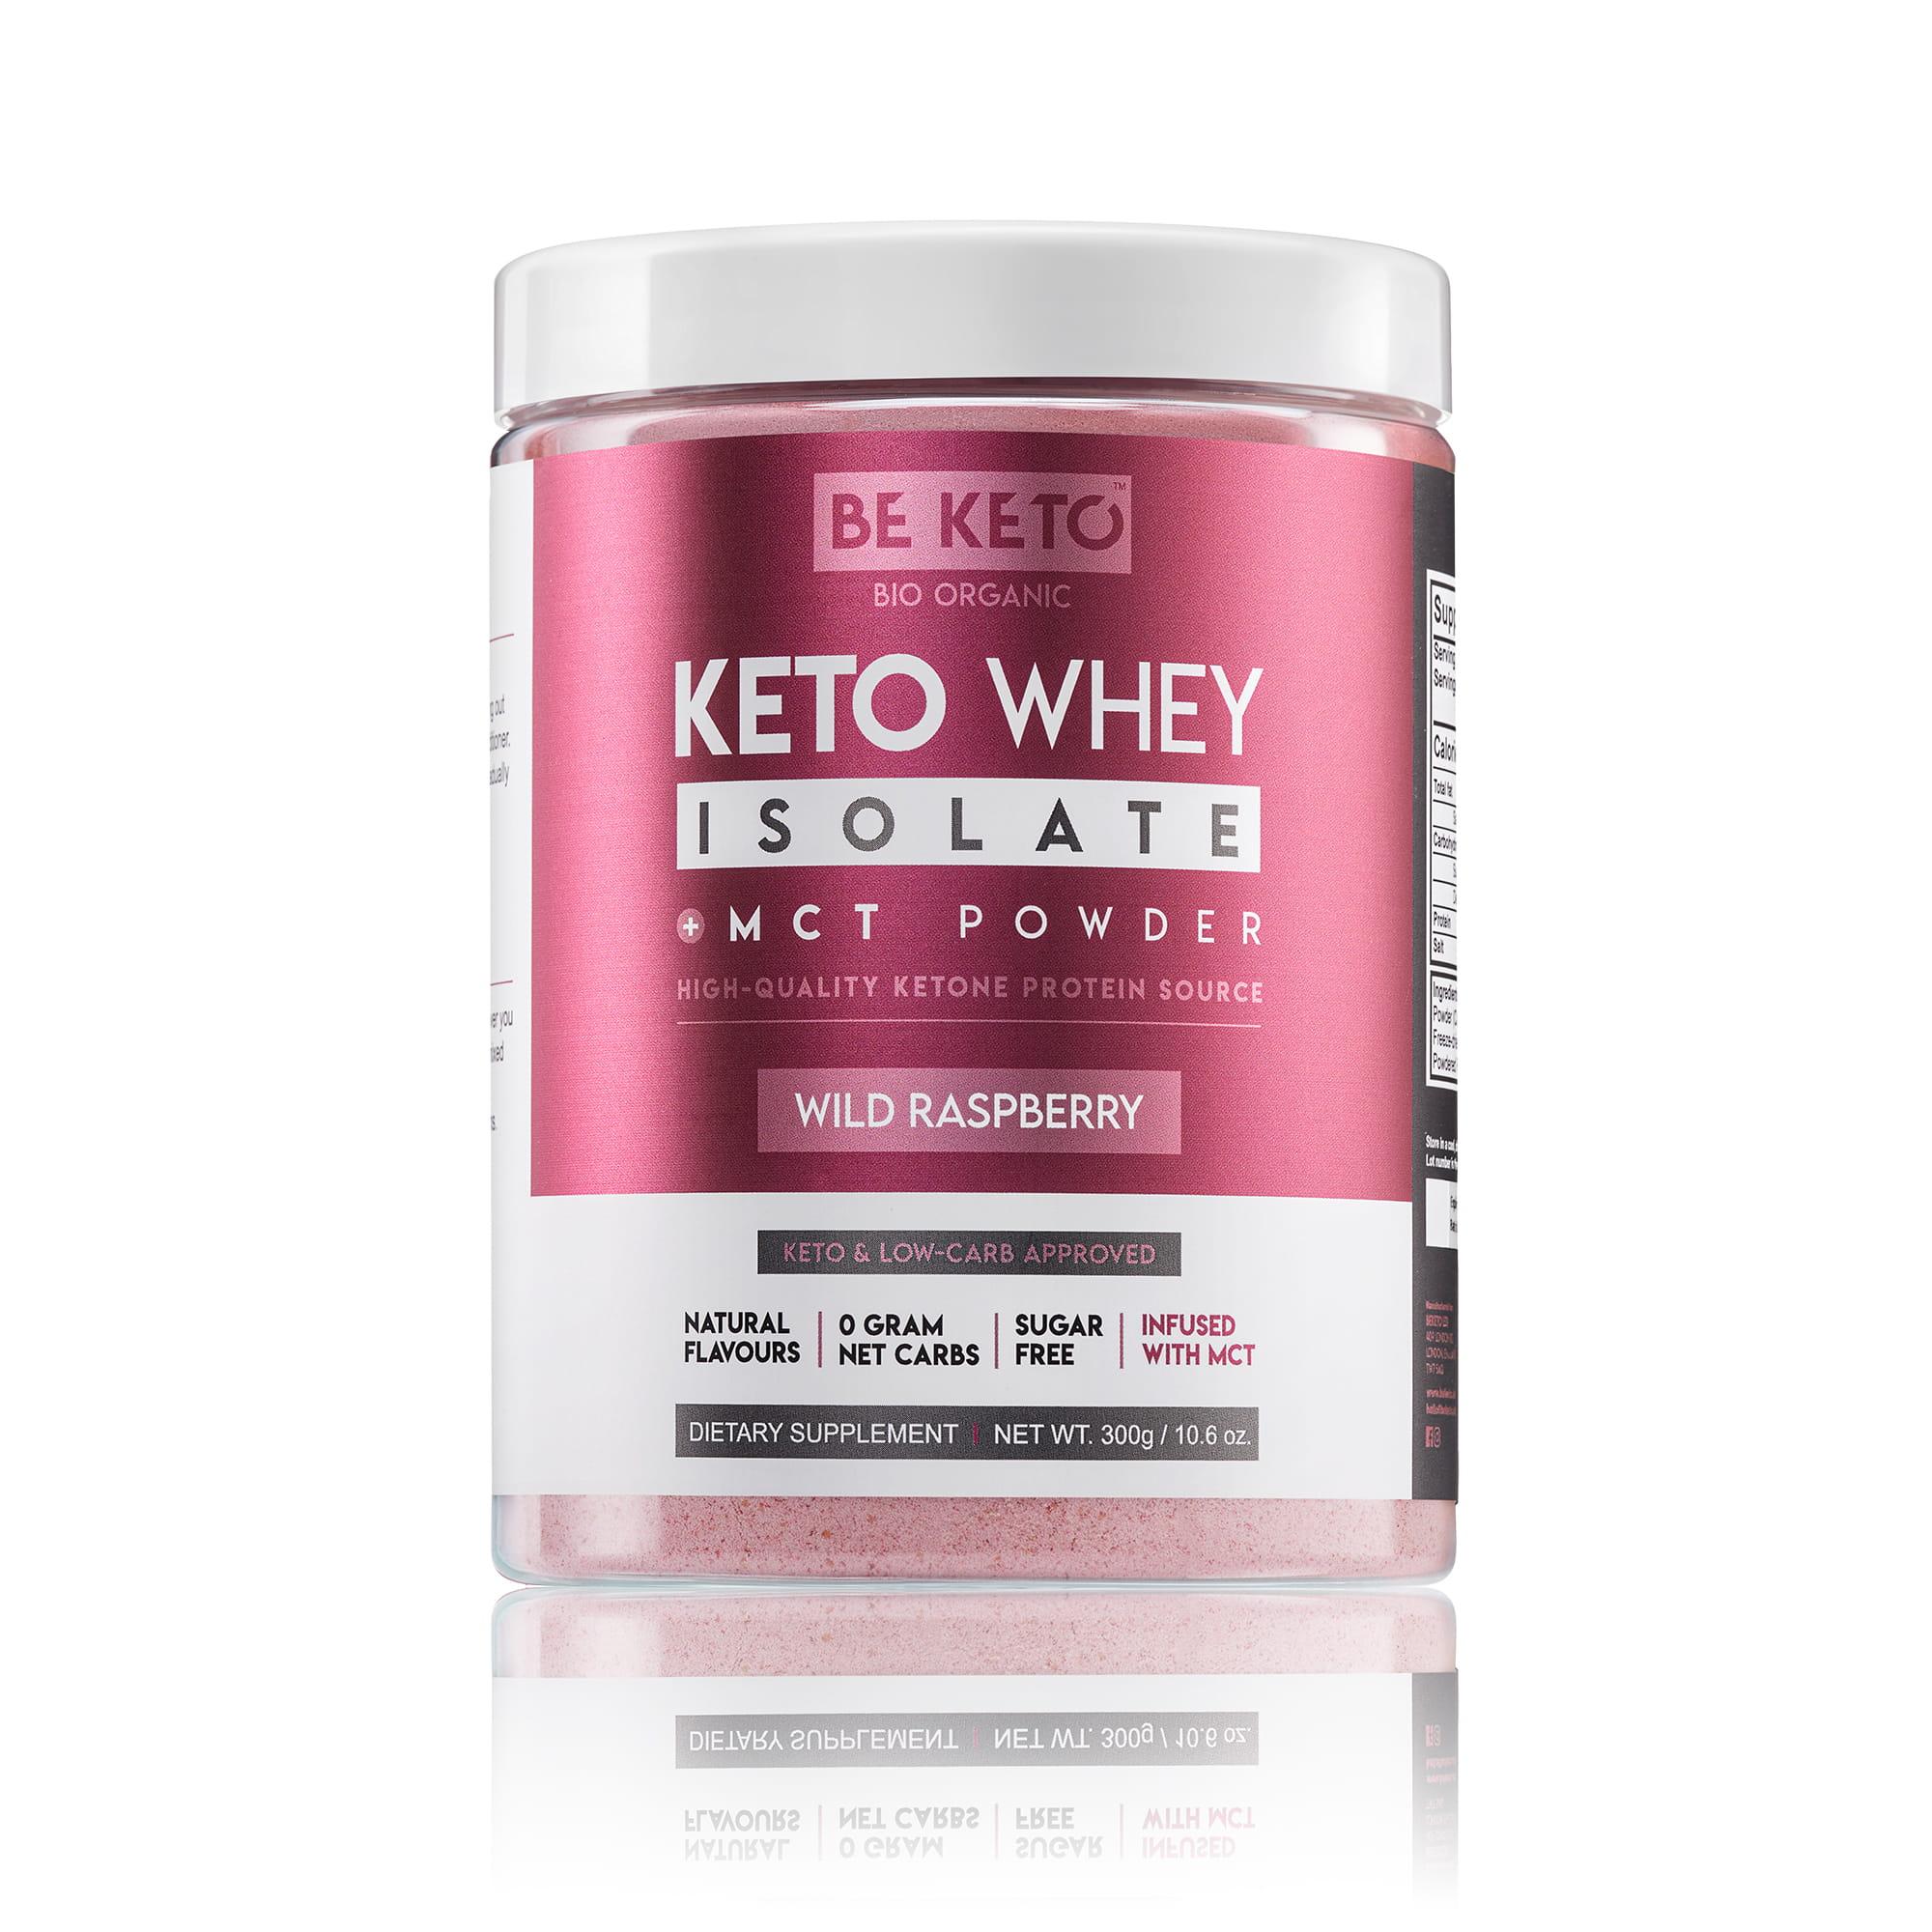 Keto Whey isolate + MCT - Wild Raspberry 300G